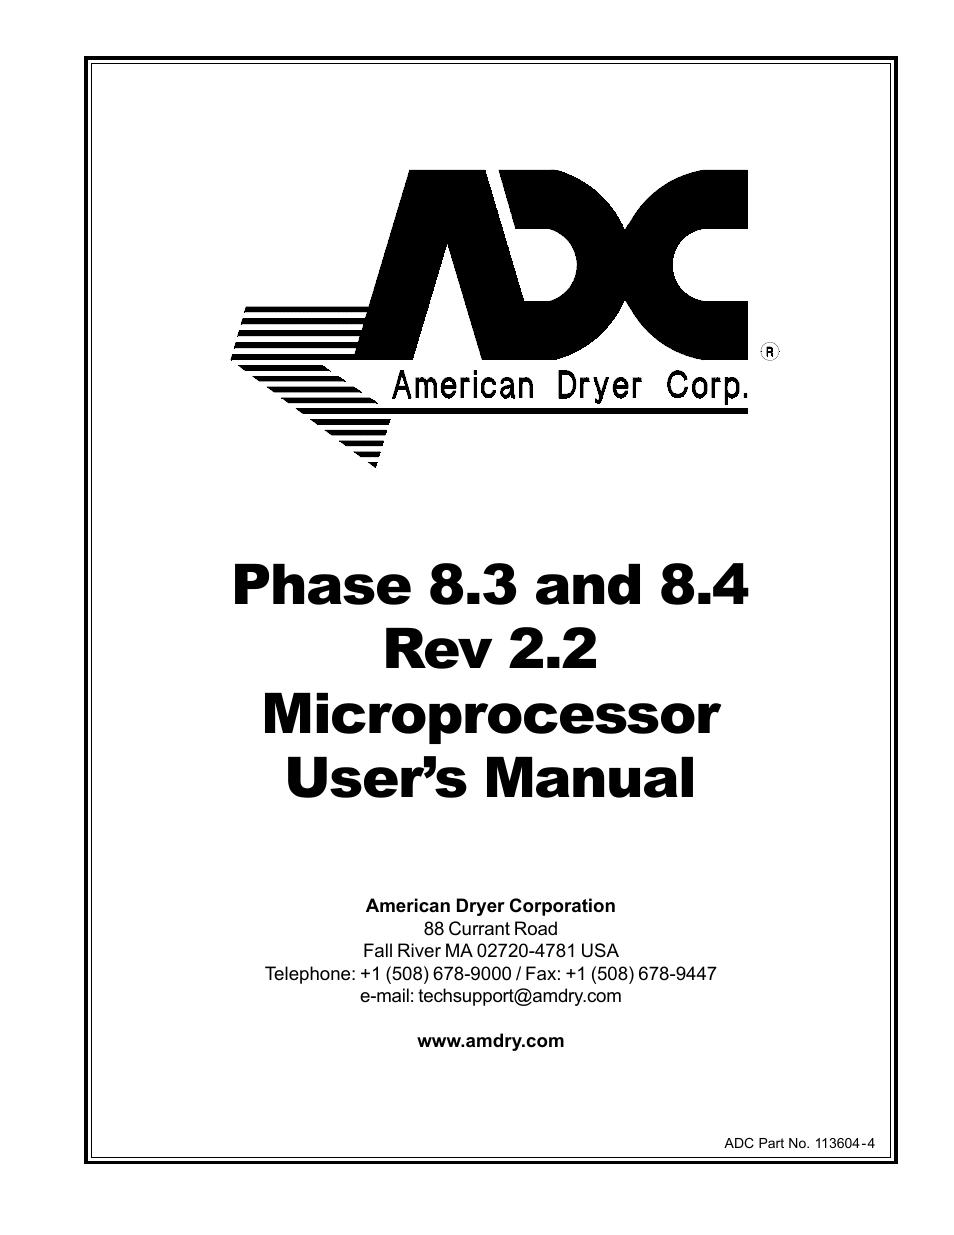 American Dryer Corp. Microprocessor 8.4 Rev 2.2 User